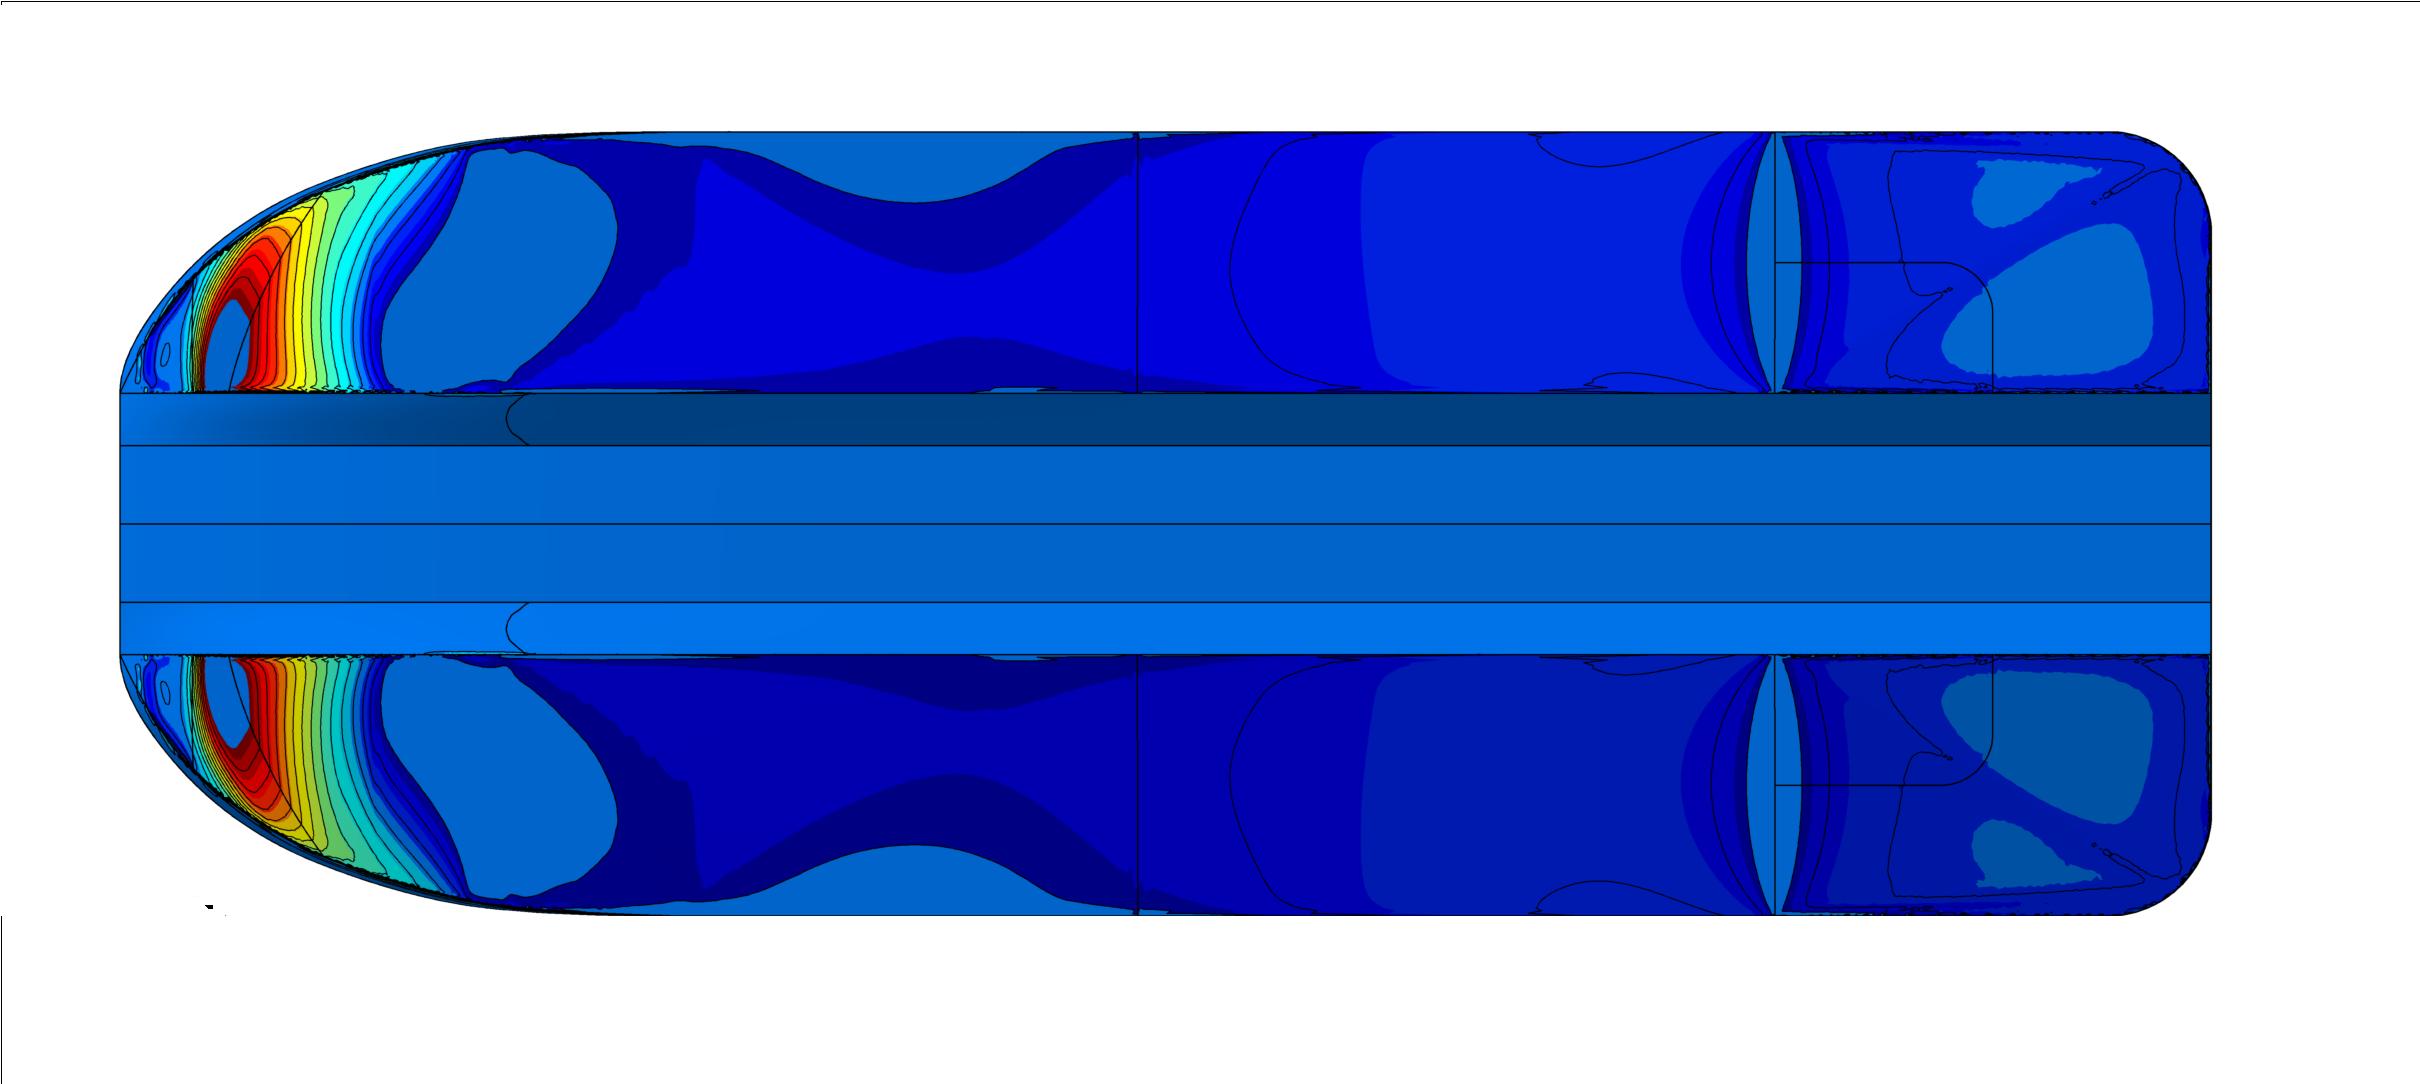 PV9KNT_hydrodinamic_press_bottom